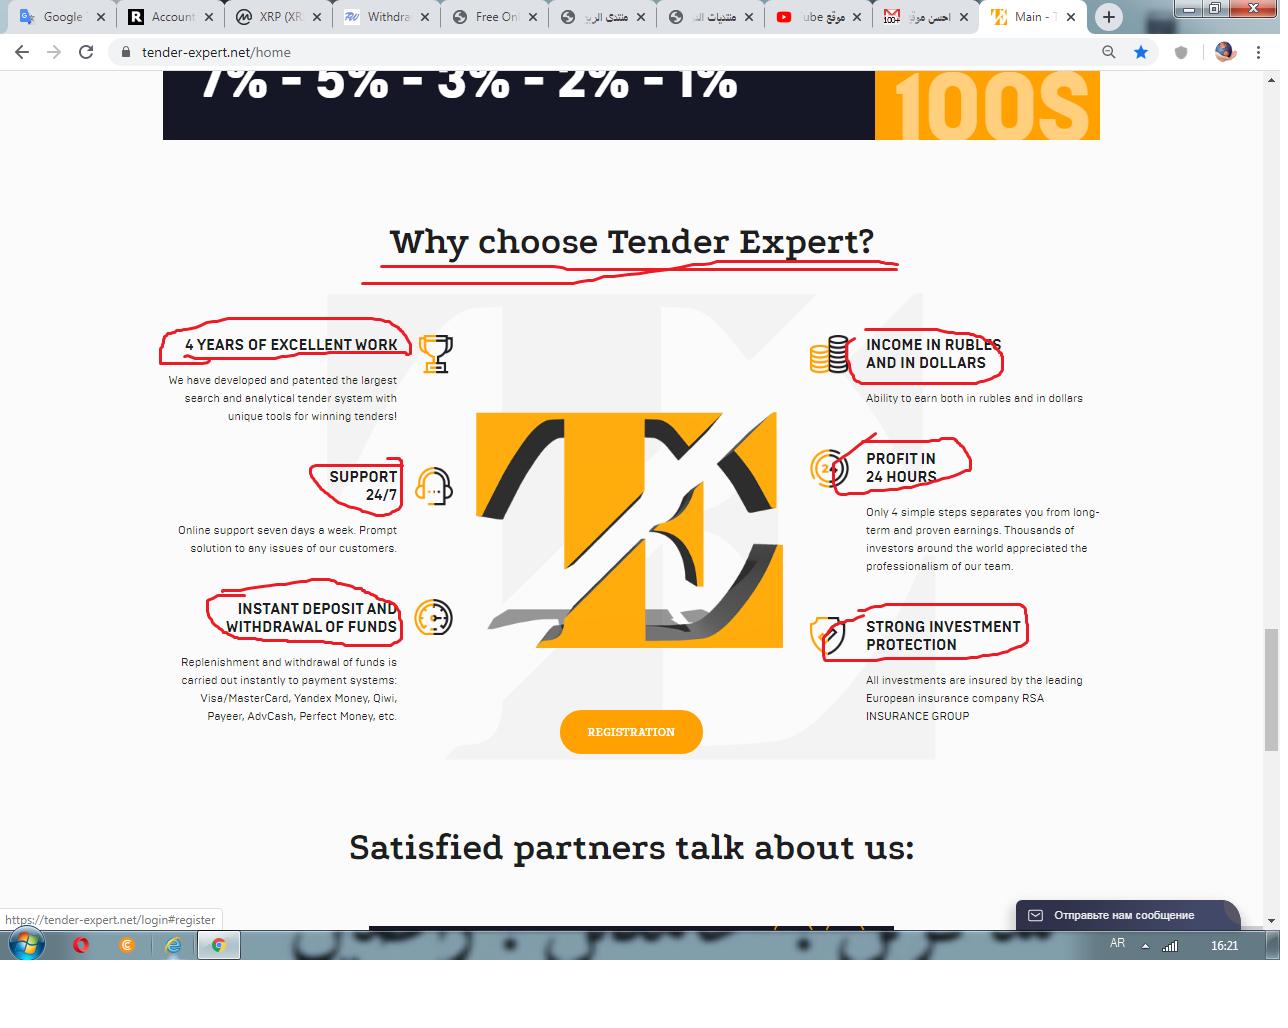 حصري ومفصل لموقع tender-expert اكثر 161024946.png